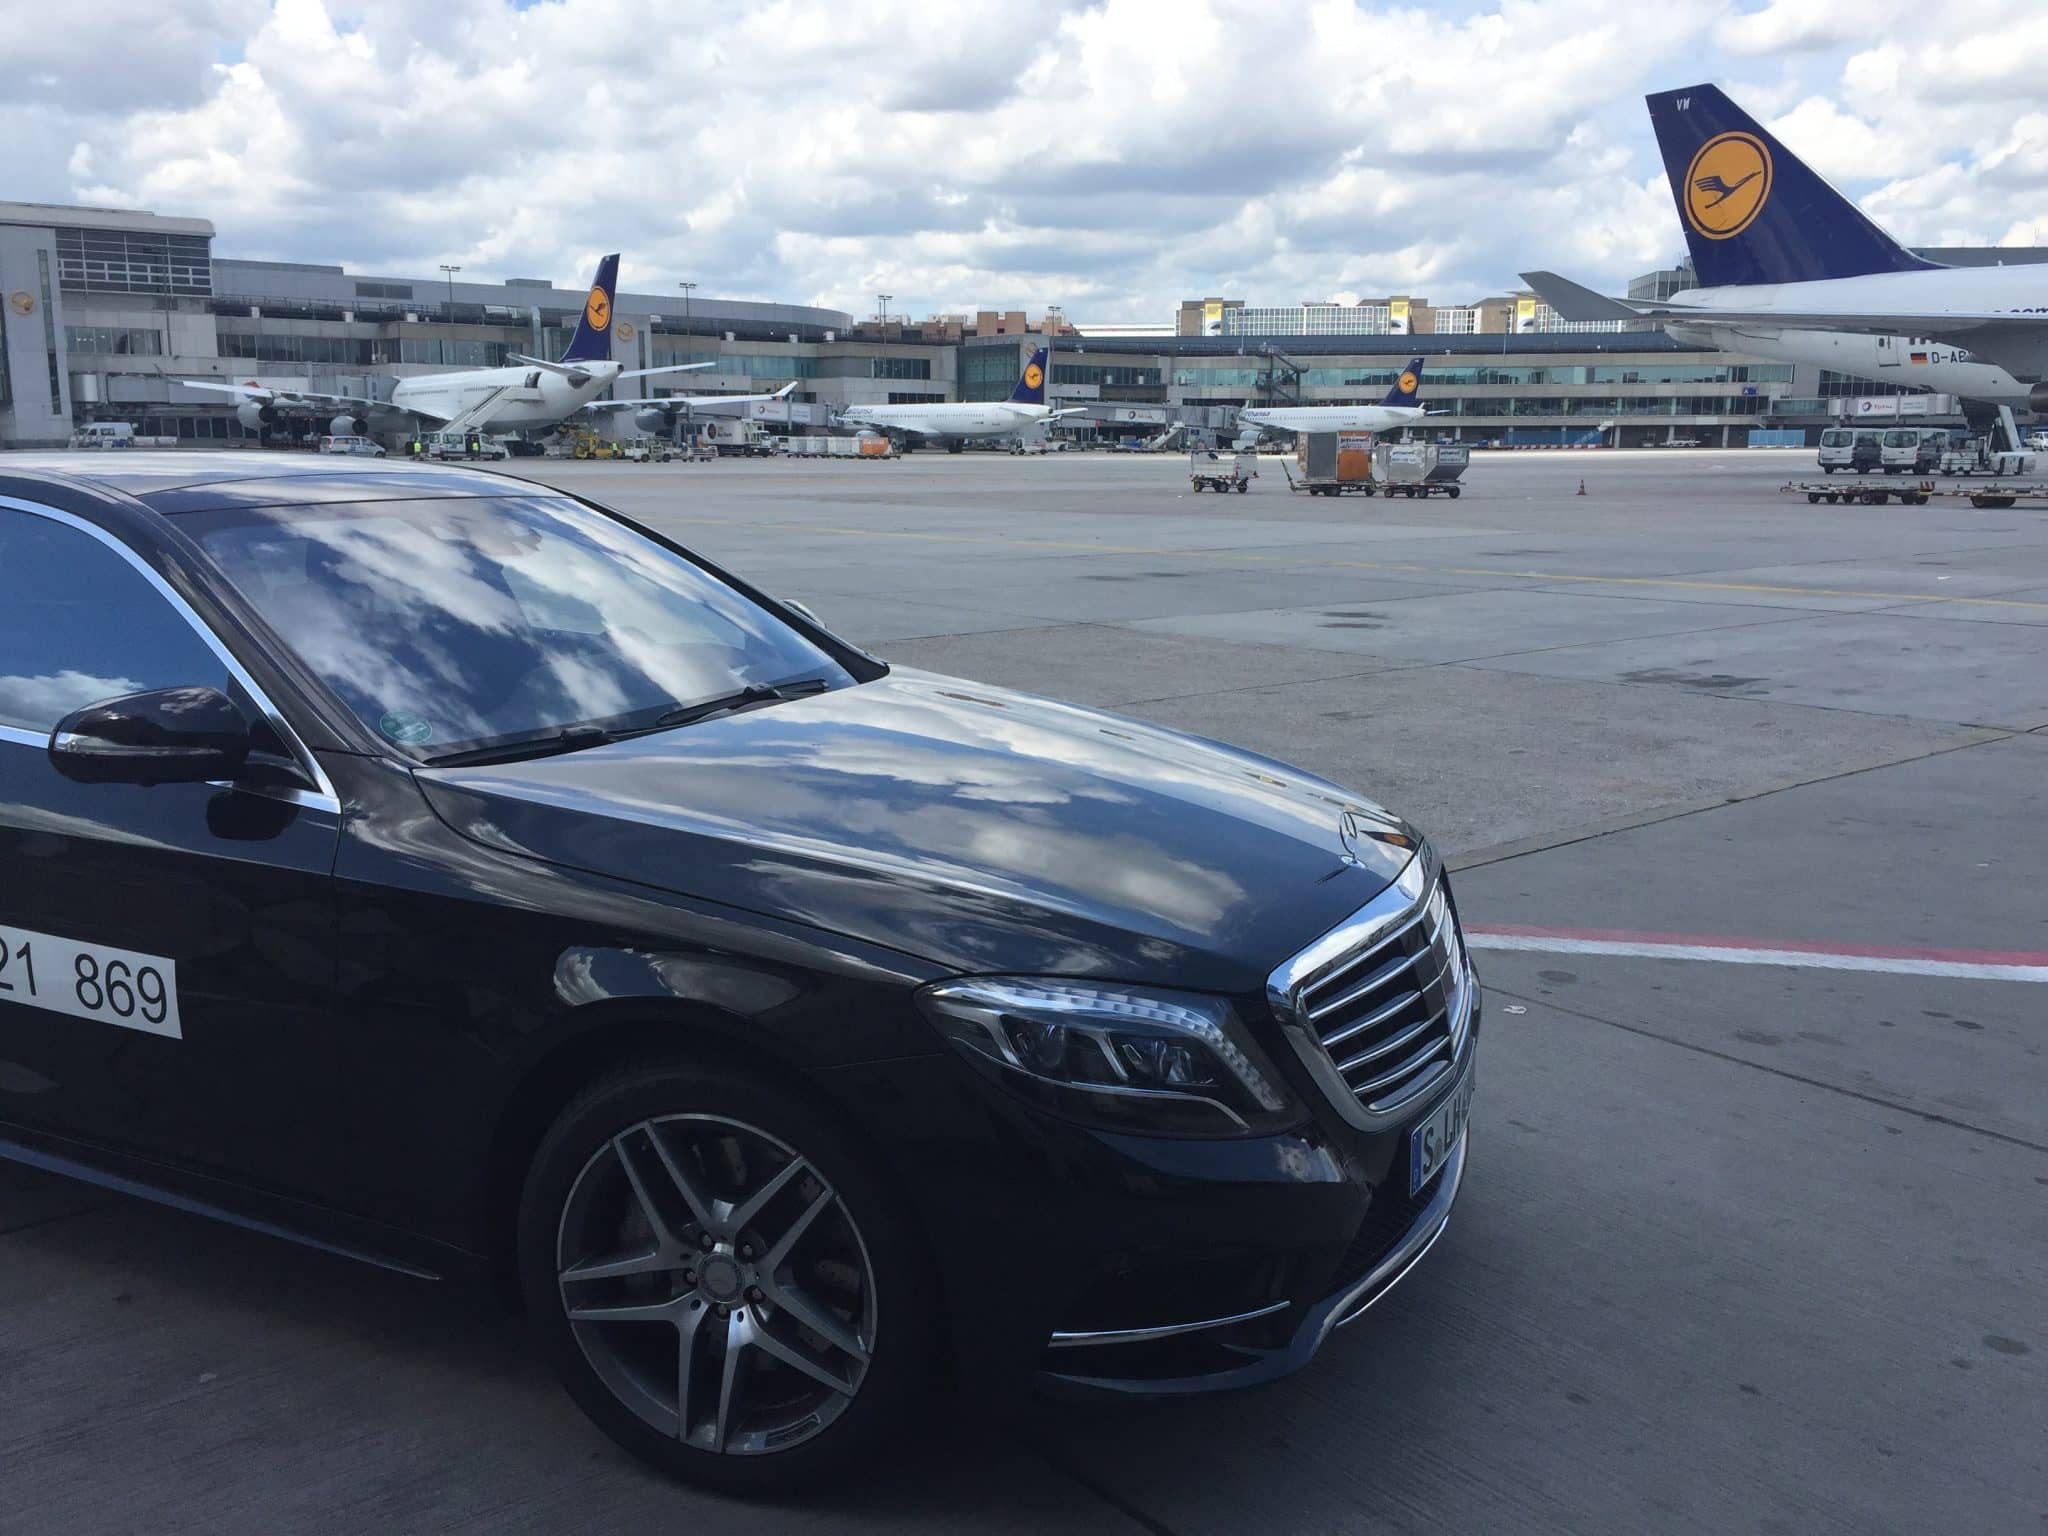 Lufthansa_First_Class_Chauffeur